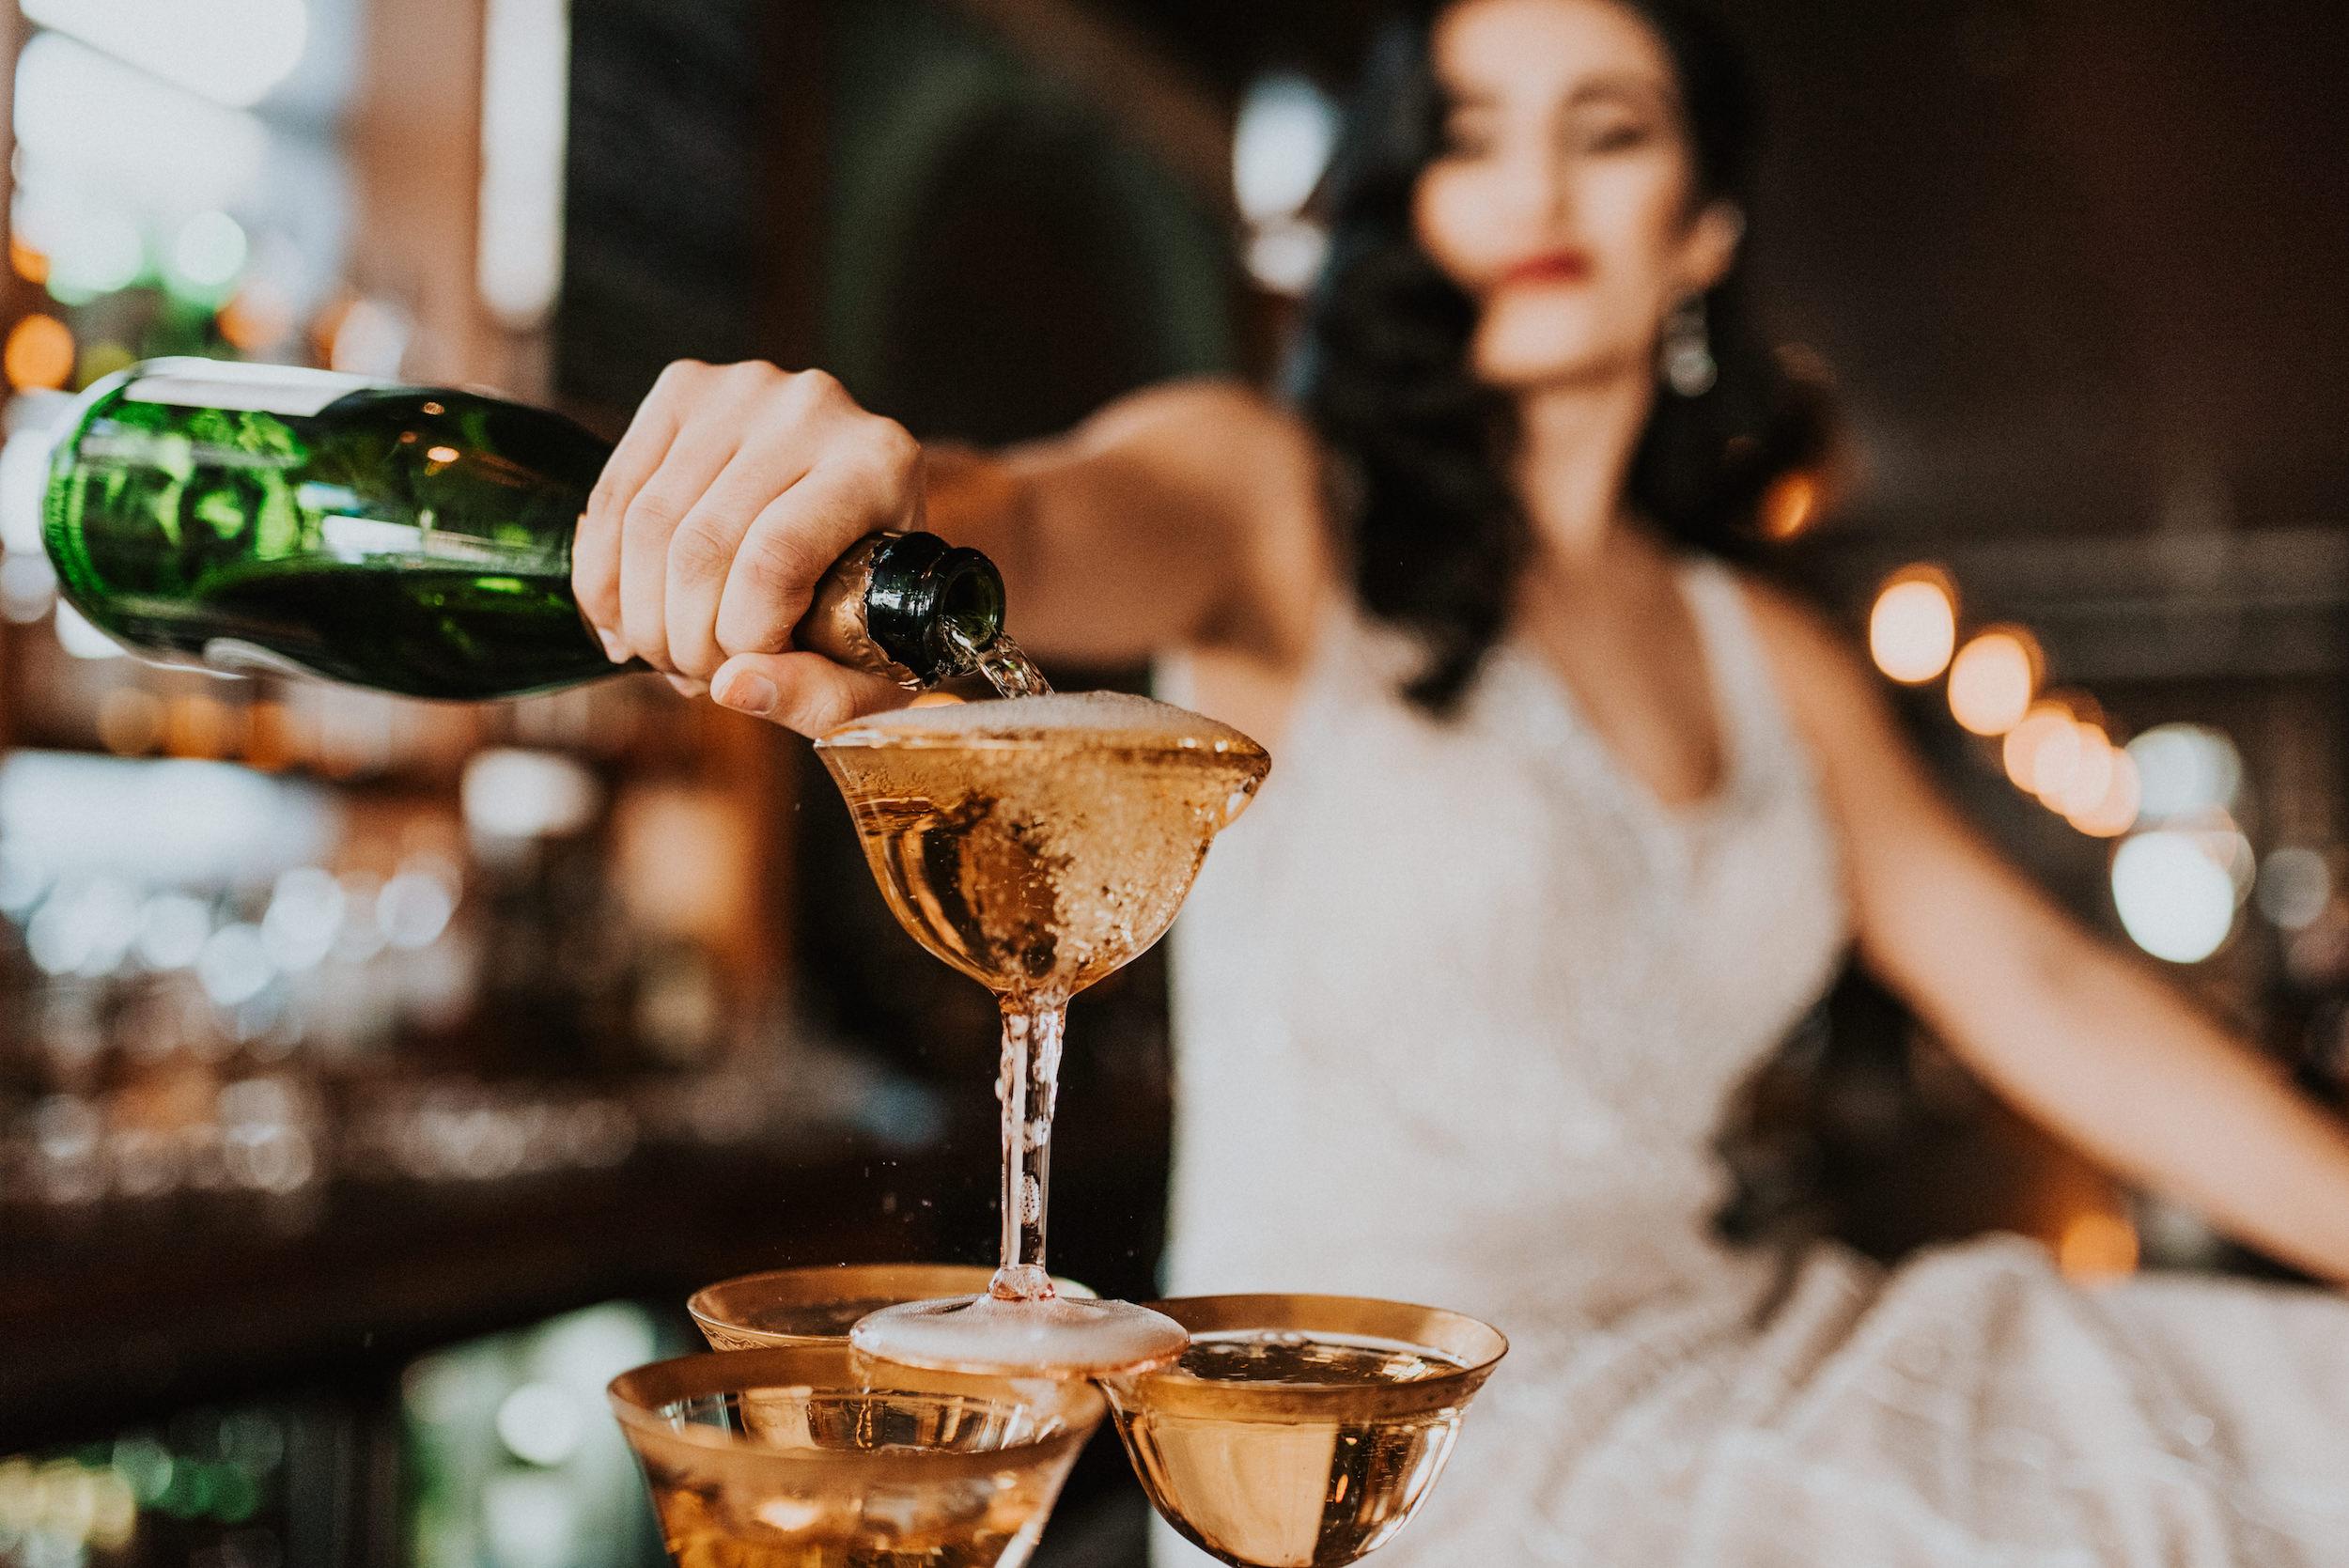 Champaign toasts wedding celebration